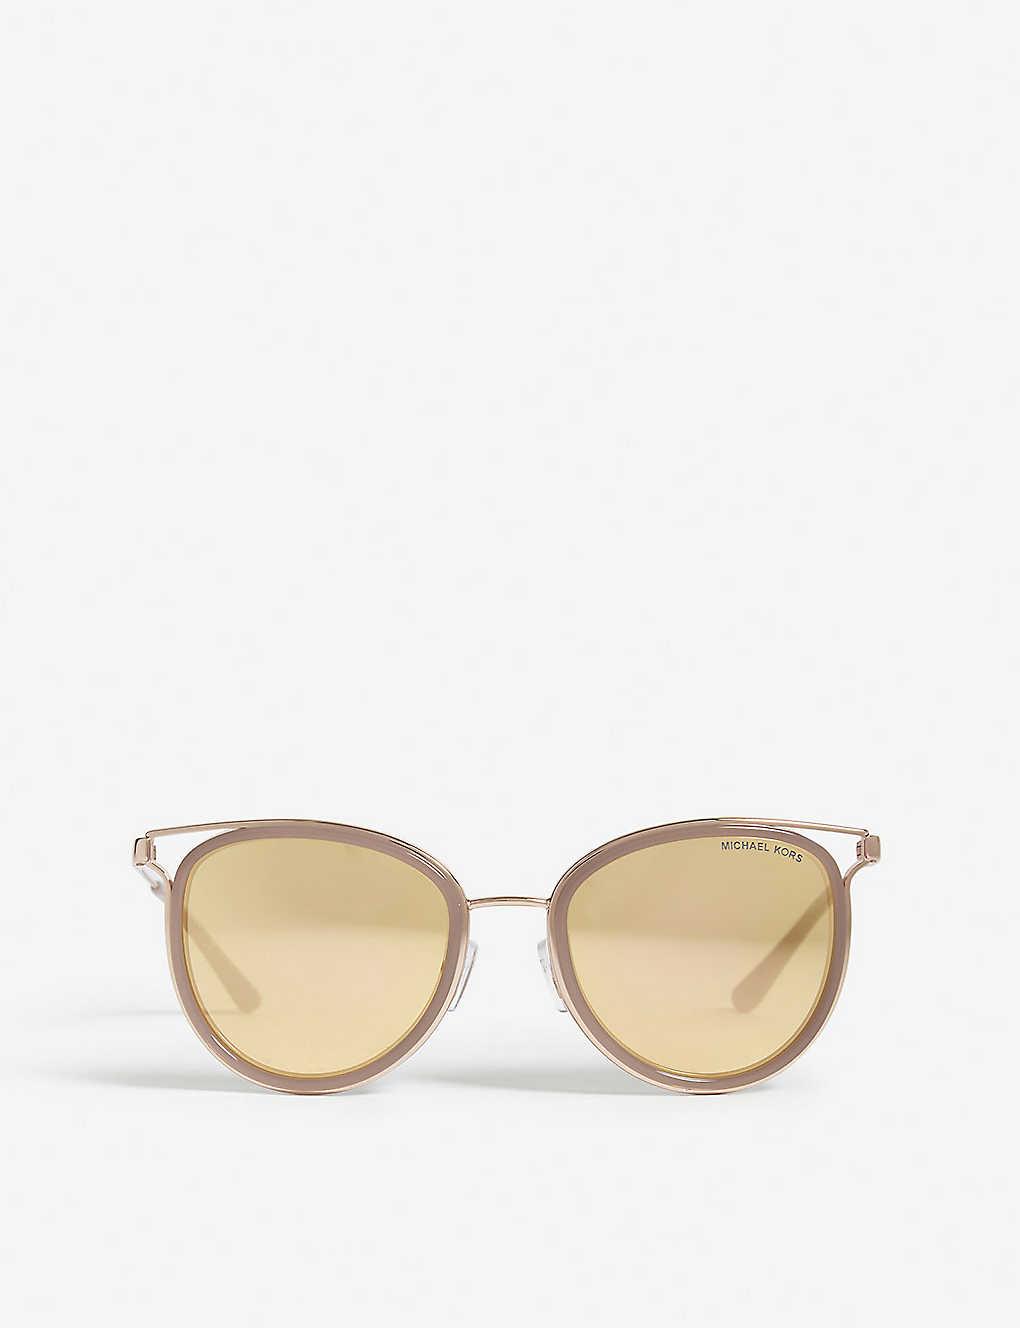 b76f3e64ff3e MICHAEL KORS - Havana cut-out cat-eye frame sunglasses | Selfridges.com